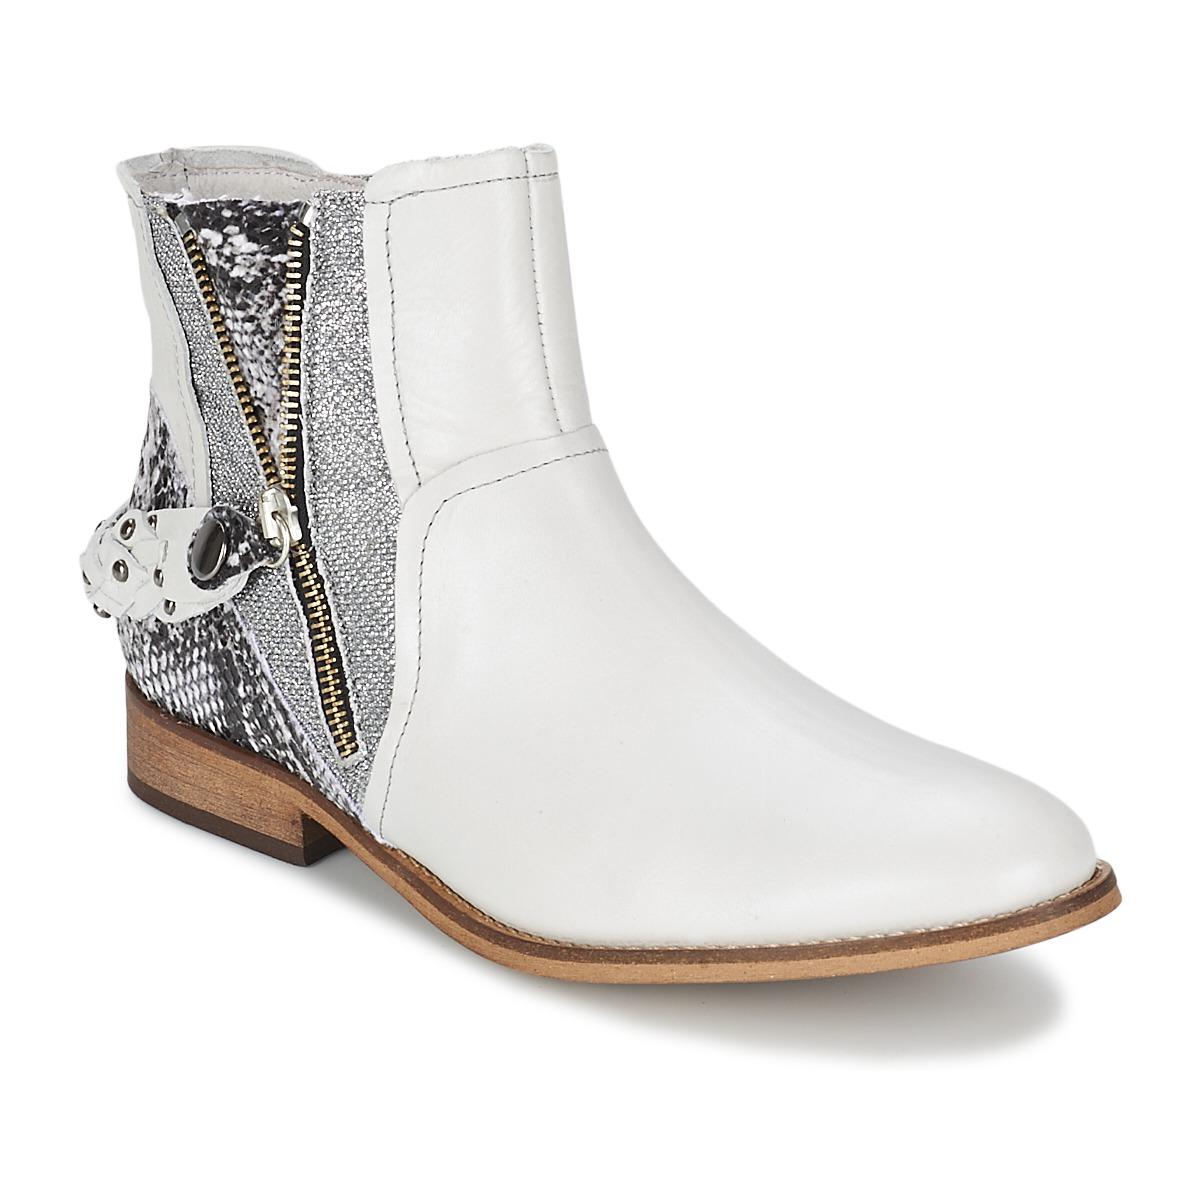 Boots Boots Spartoo Iziva Femme Femme Sur Sur Spartoo Iziva NOv0y8nwm